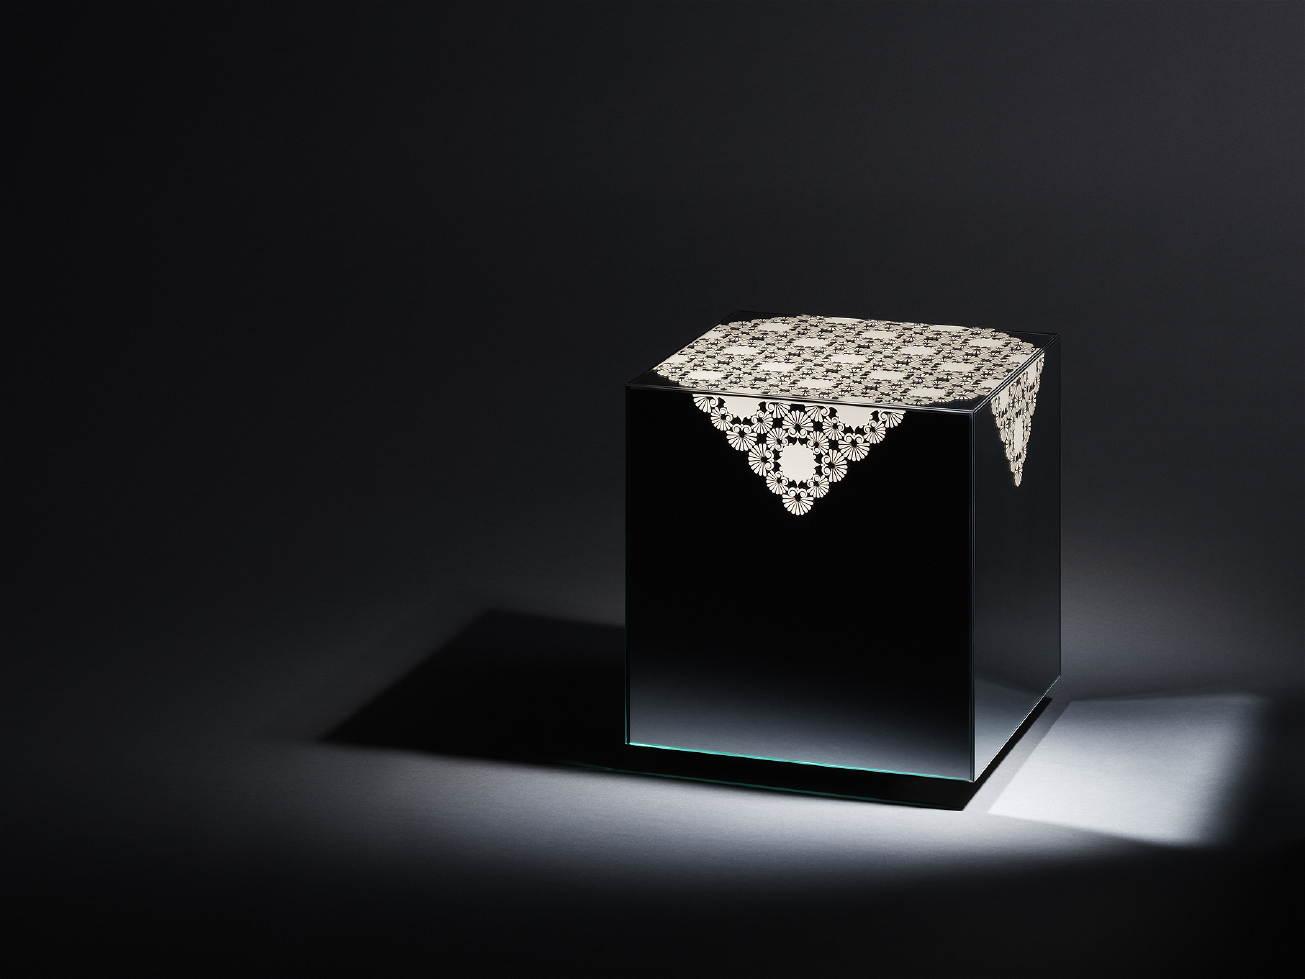 Junge Designer Möbel blickfang in wien 140 junge designer zeigen möbel und